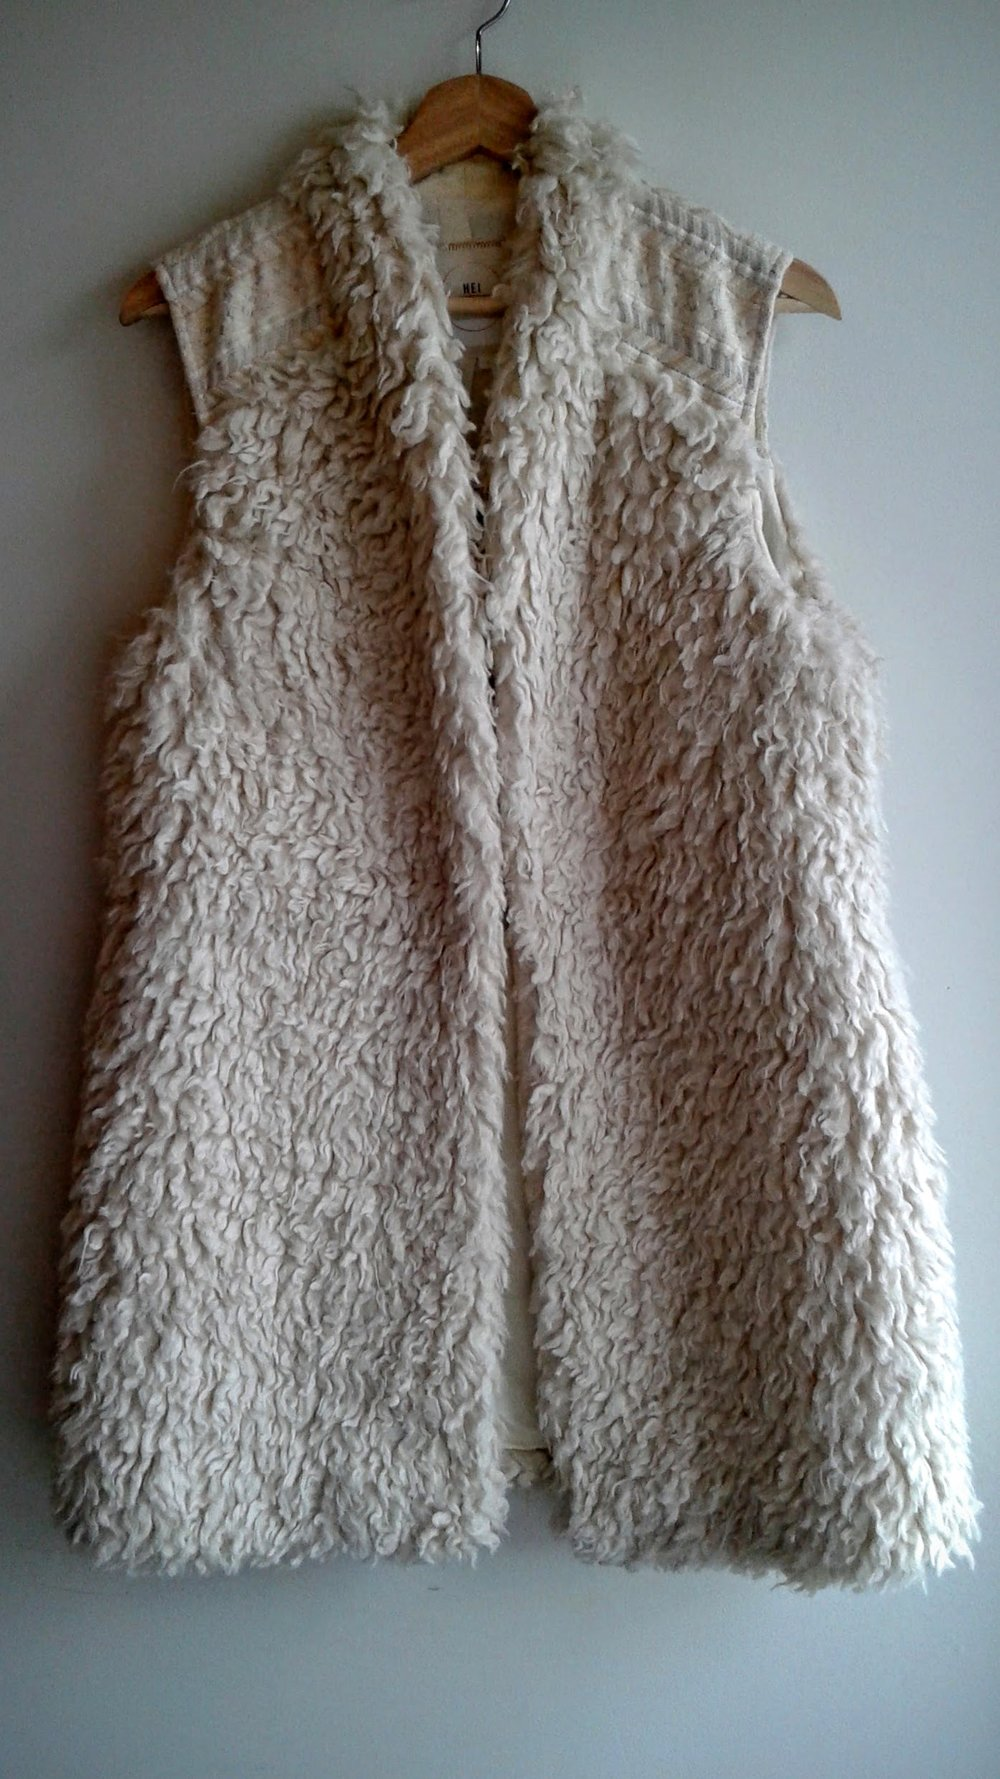 Hei Hei vest (NWT); Size M, $48